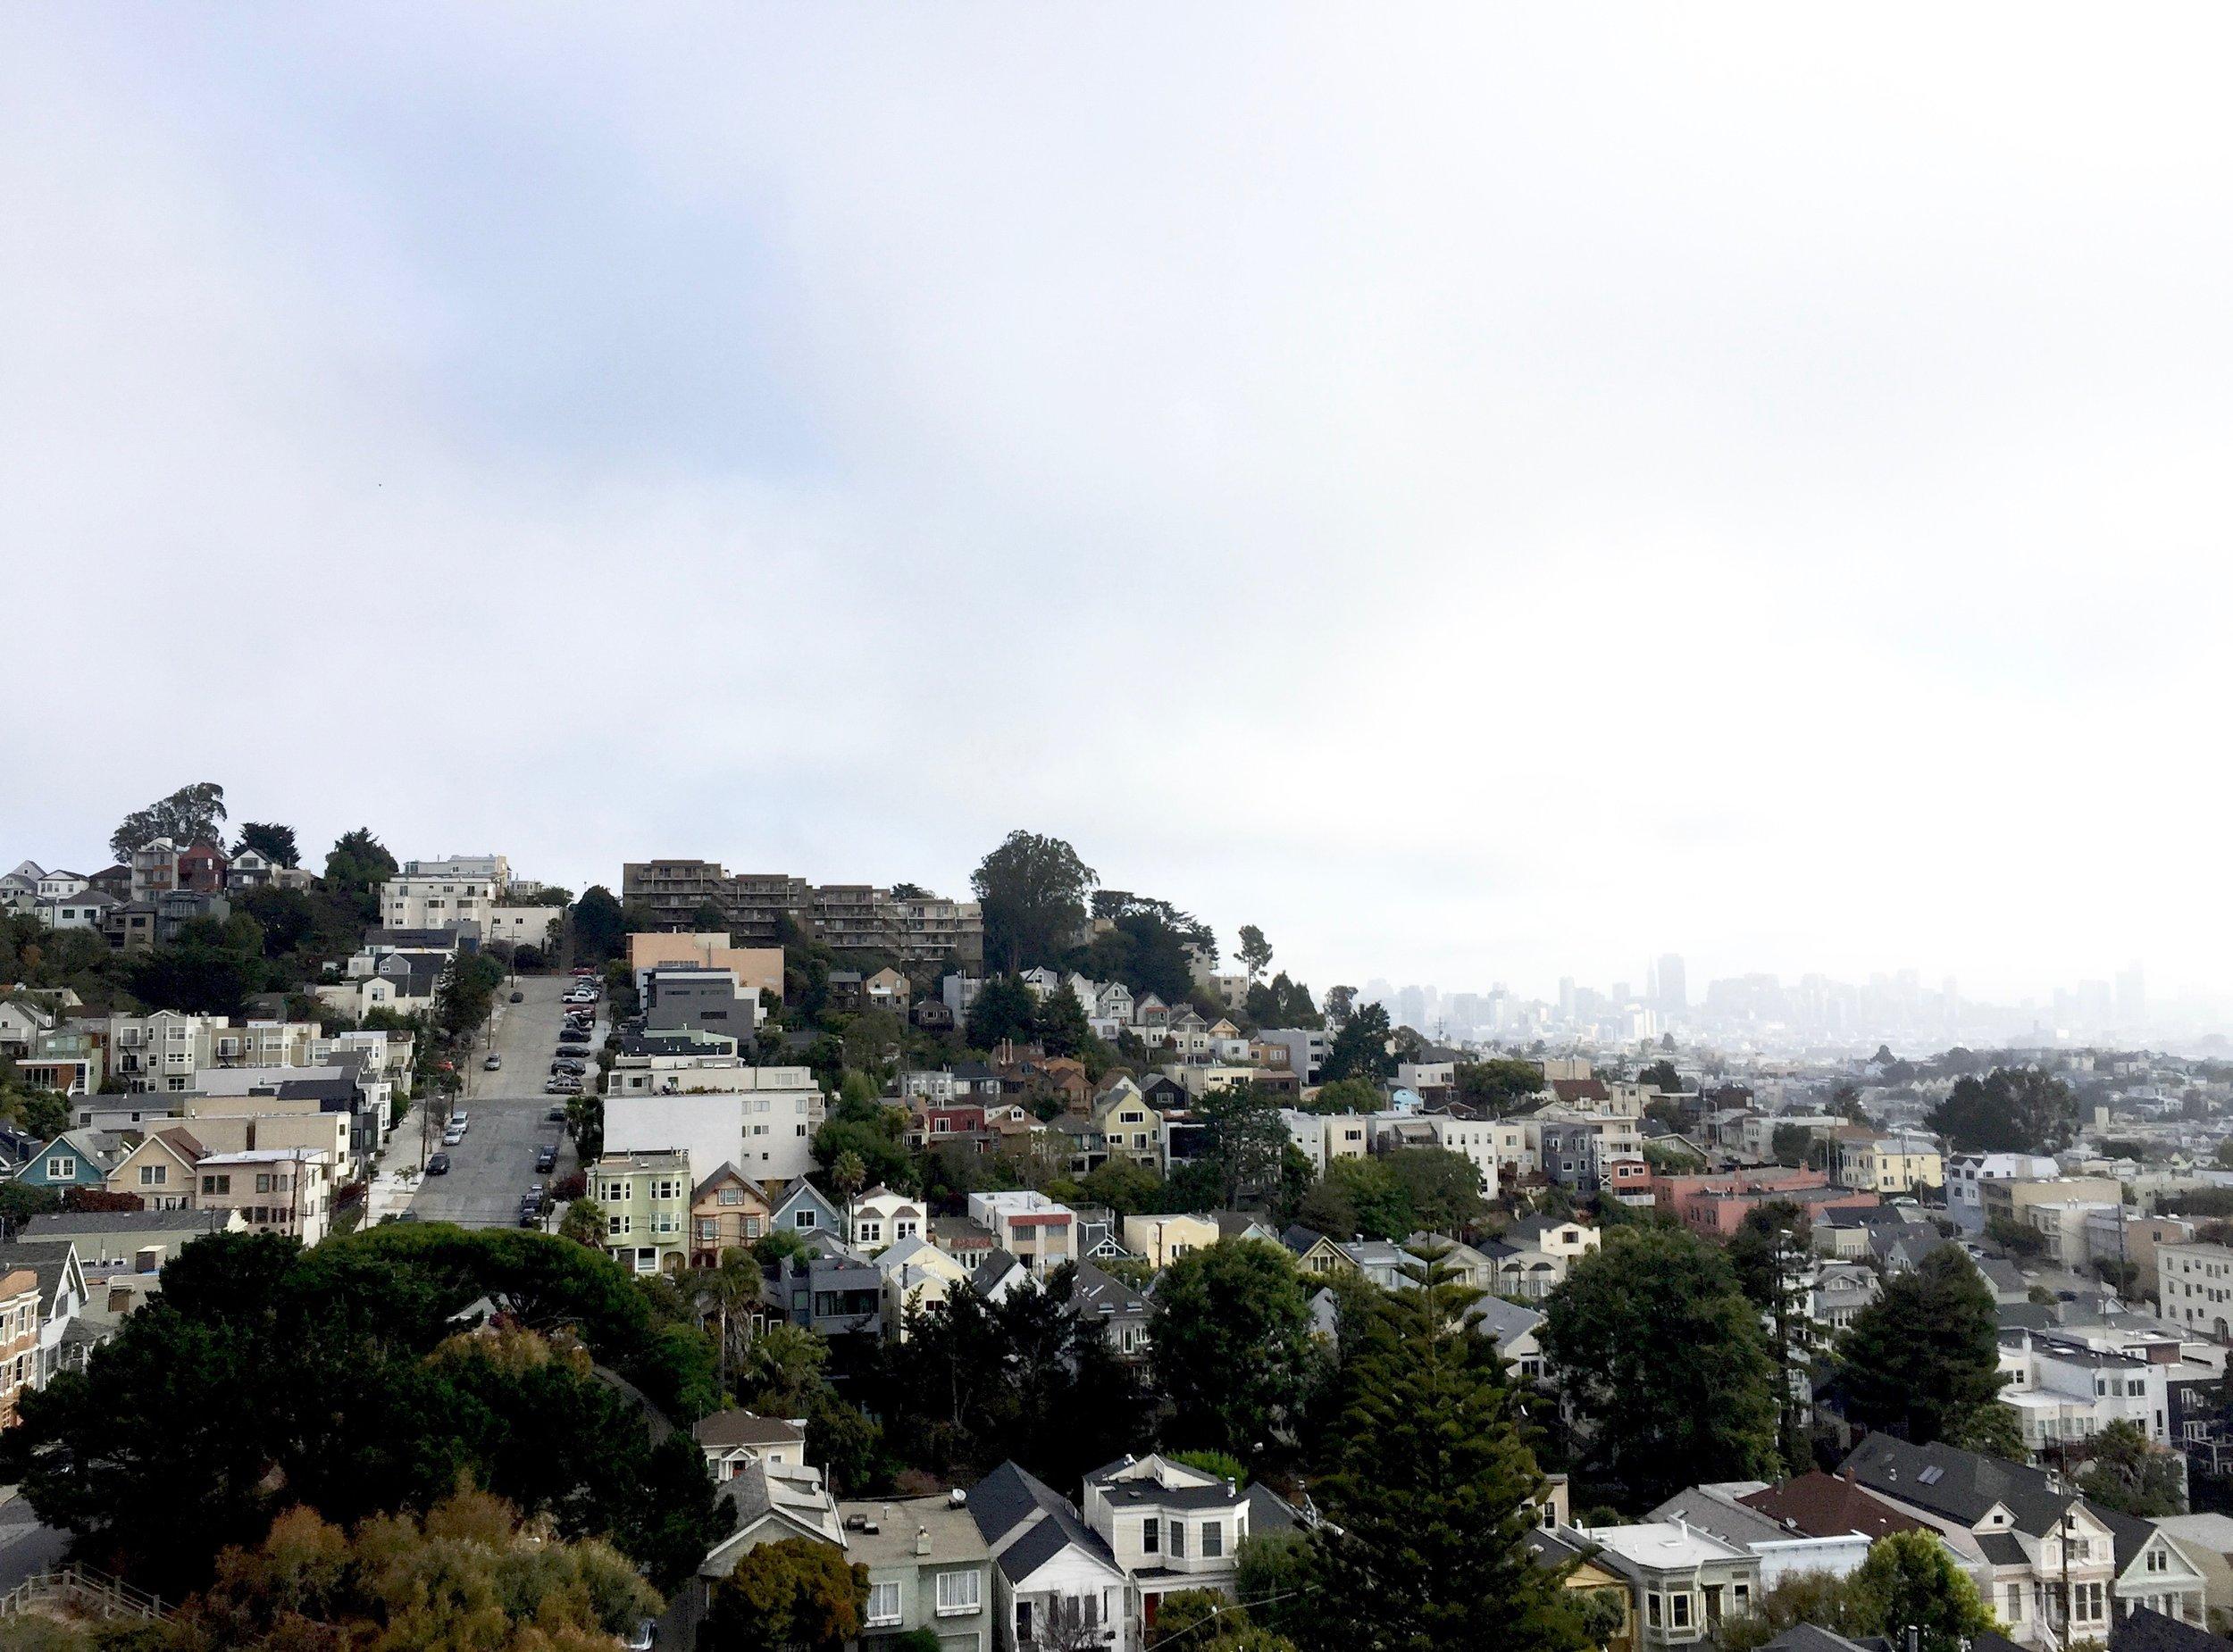 San Francisco, CA . August 2016